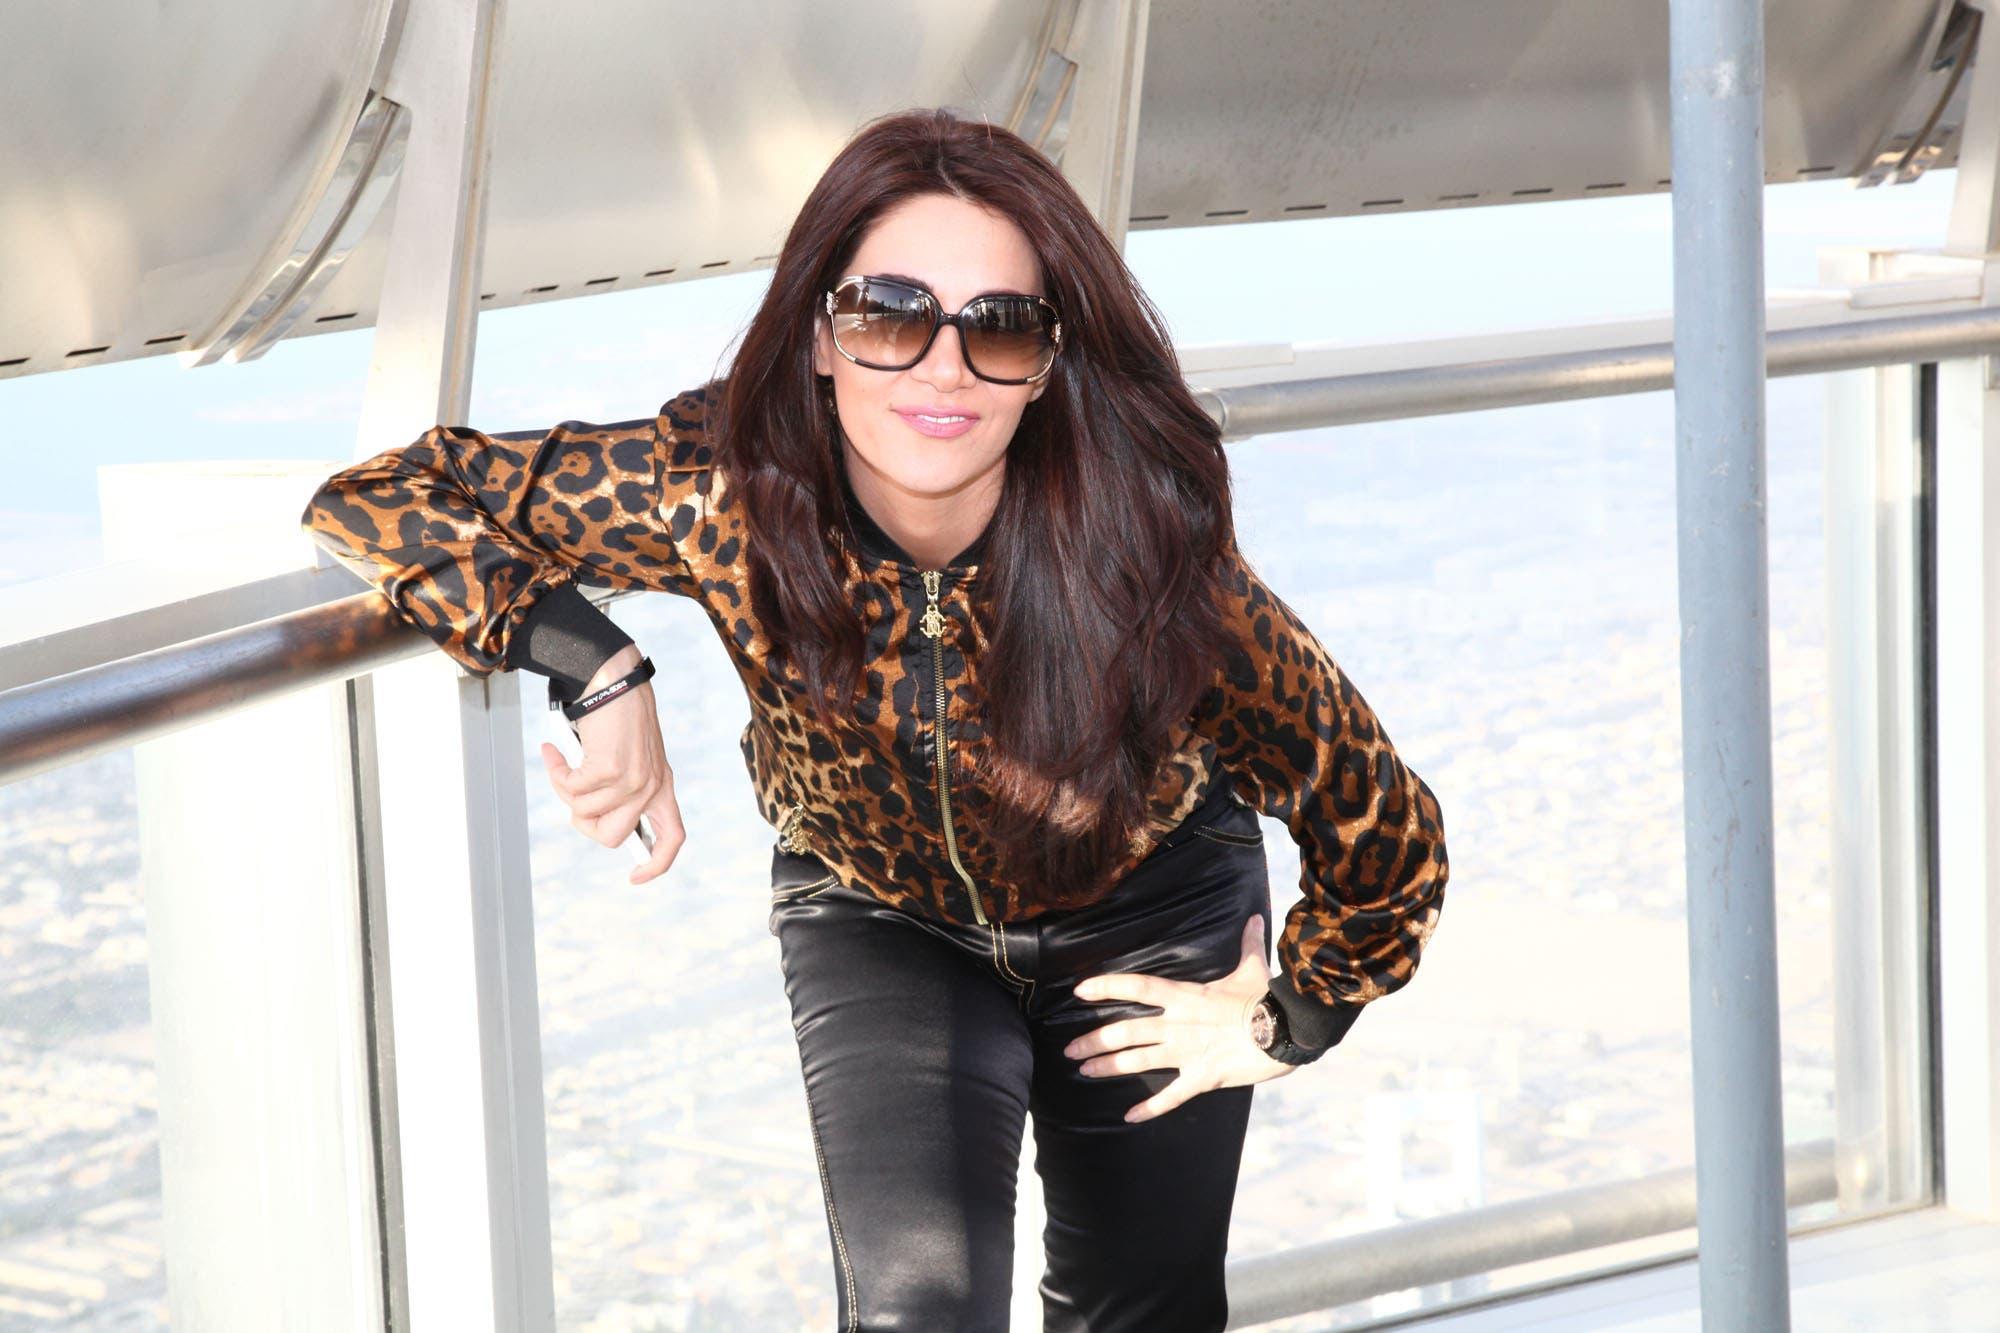 Diana Haddad breaks records at Dubai's Burj Khalifa crest, 164th floor